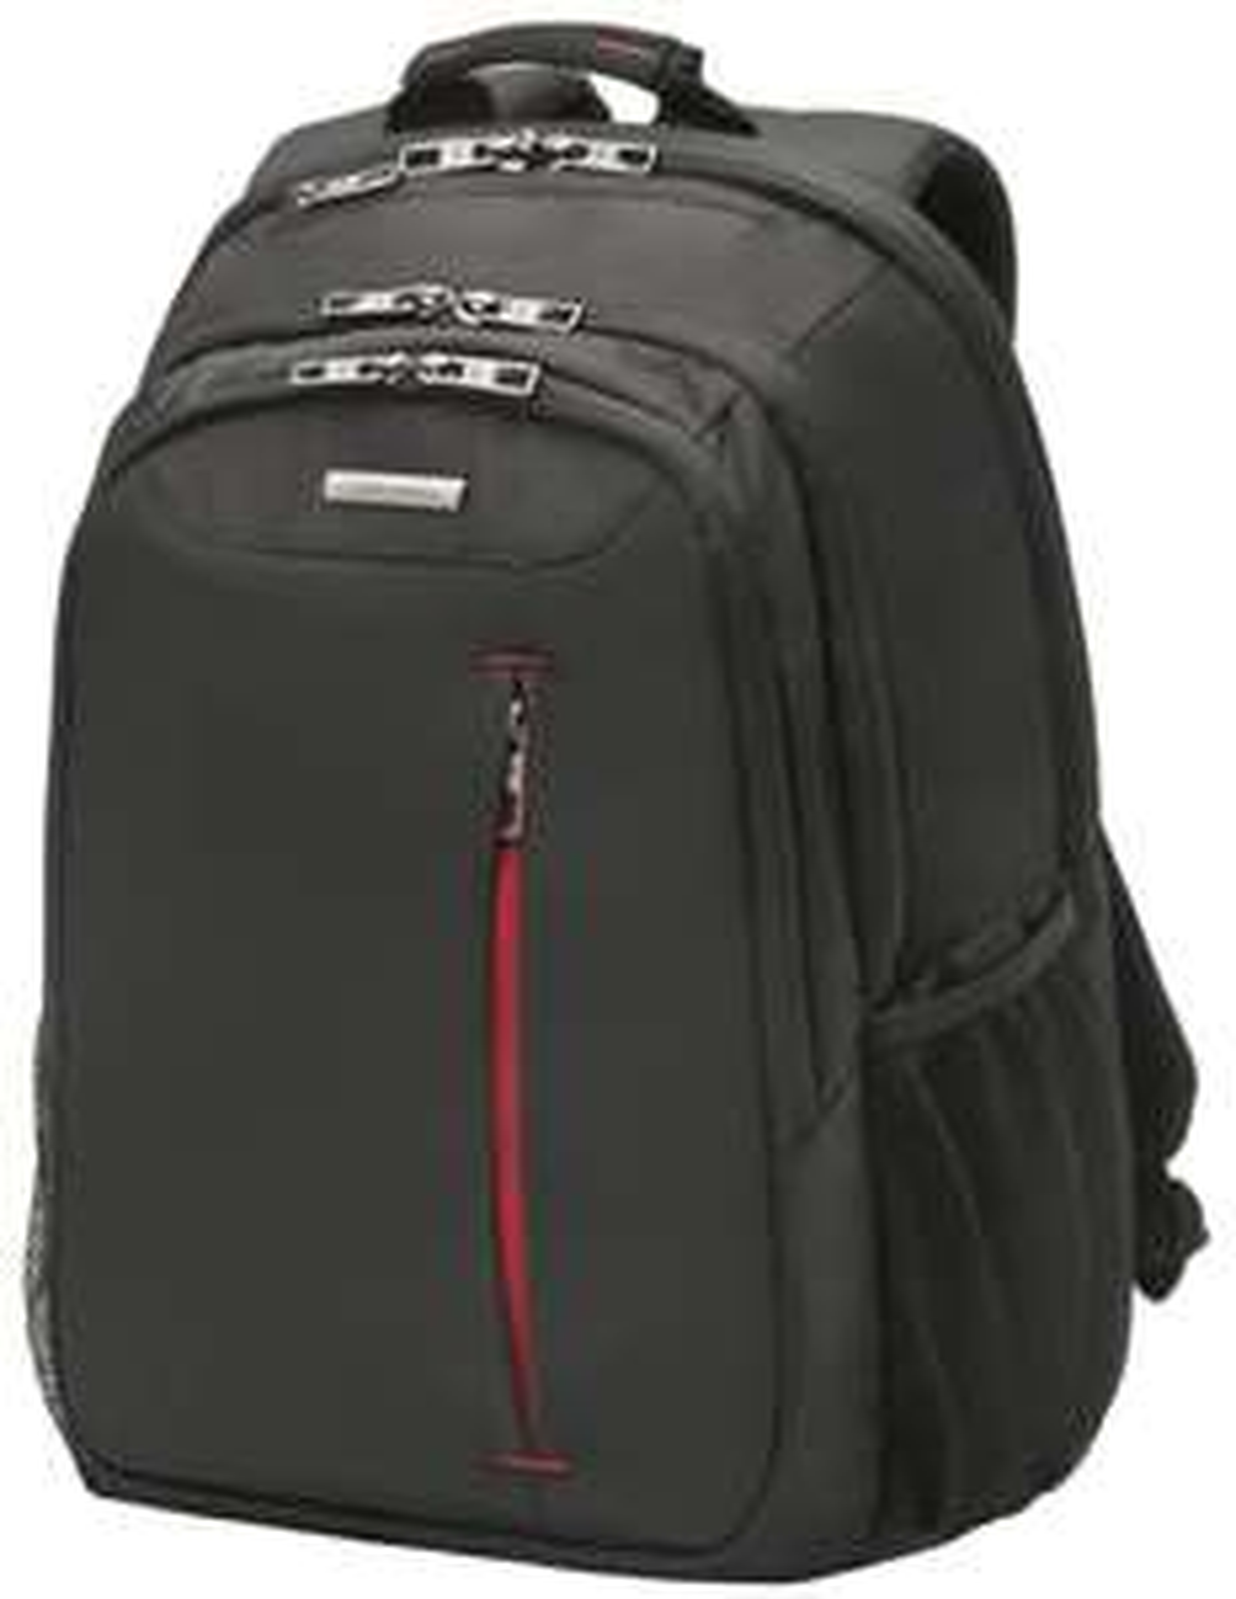 Samsonite Guard-IT Laptop Backpack 15.6 inch £22.26 w/code + 2 Year Guarantee @ Ryman (free c+c)